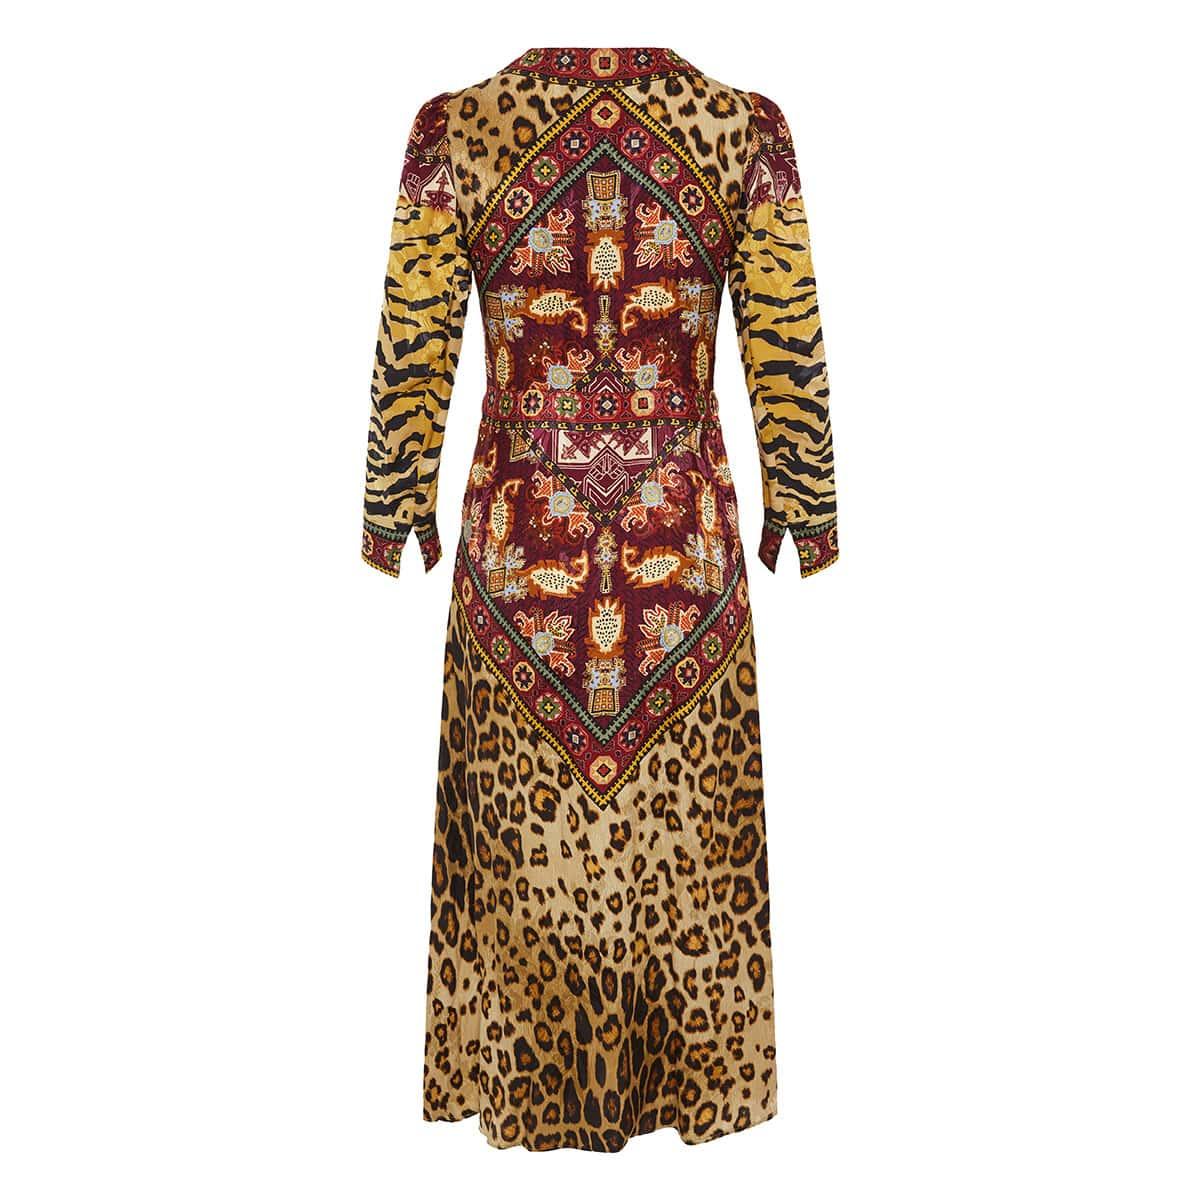 Patchwork printed jacquard midi dress